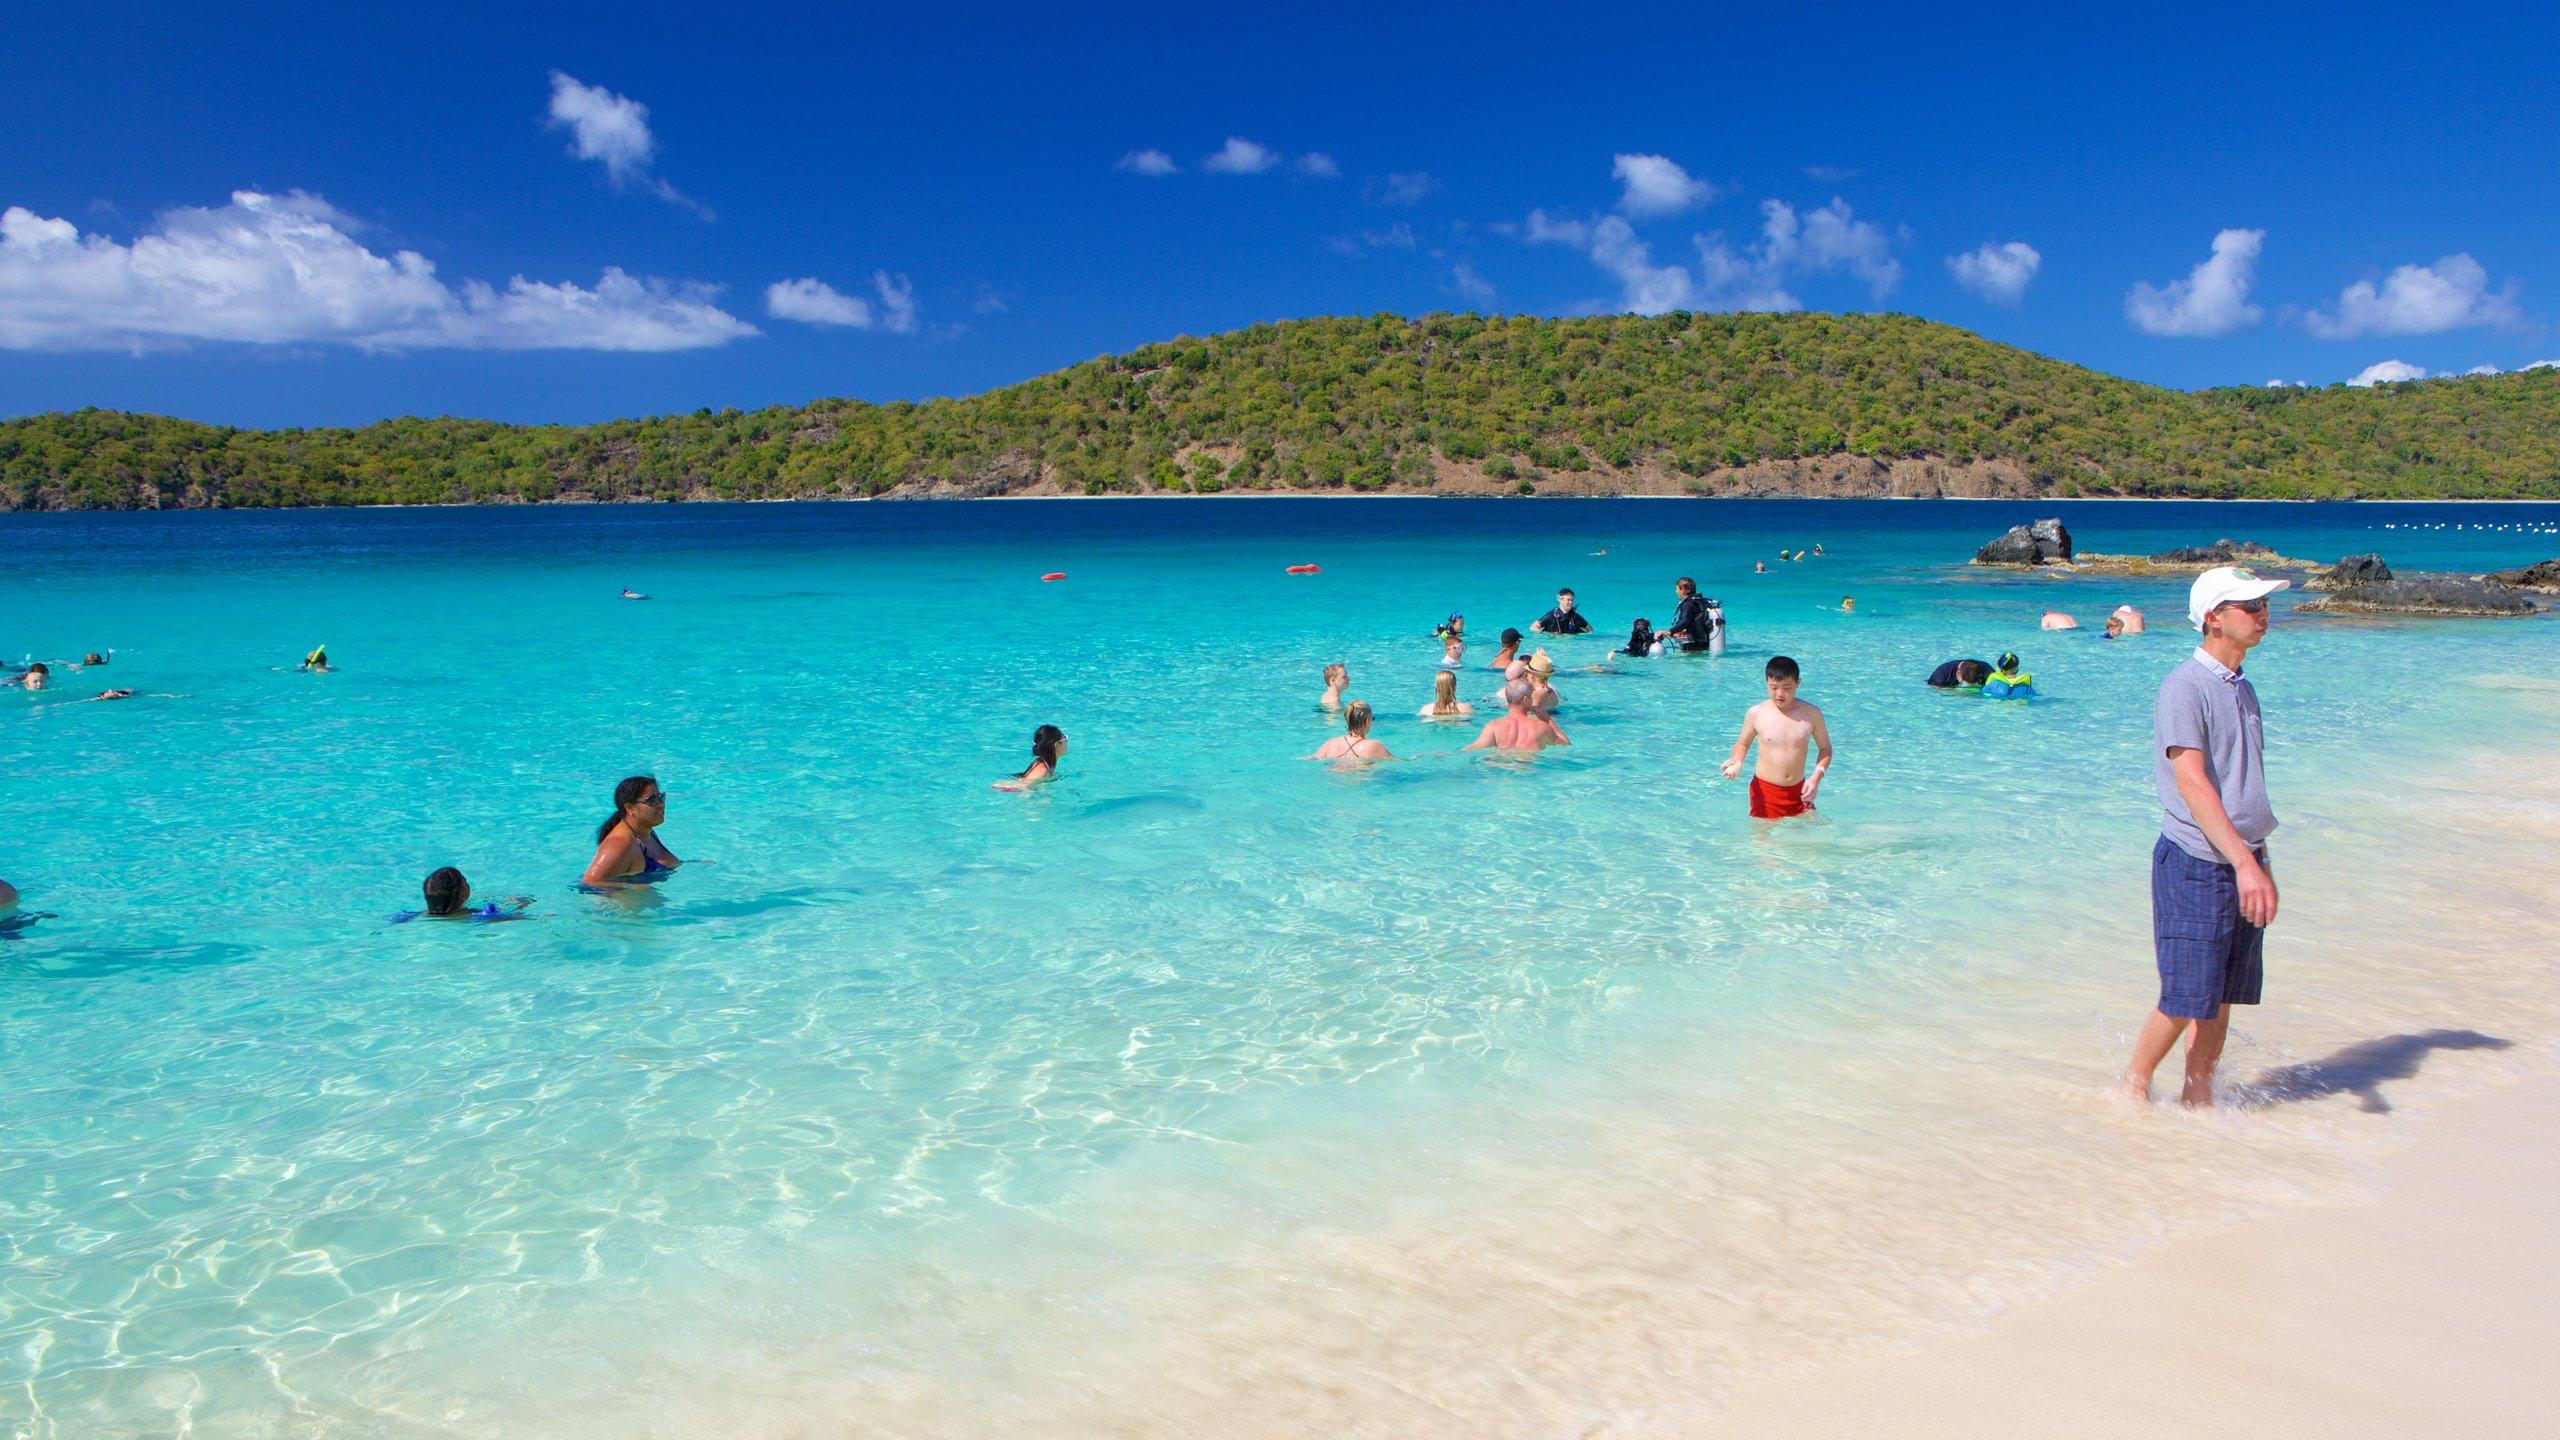 Coki Point Beach, St. Thomas, U.S. Virgin Islands